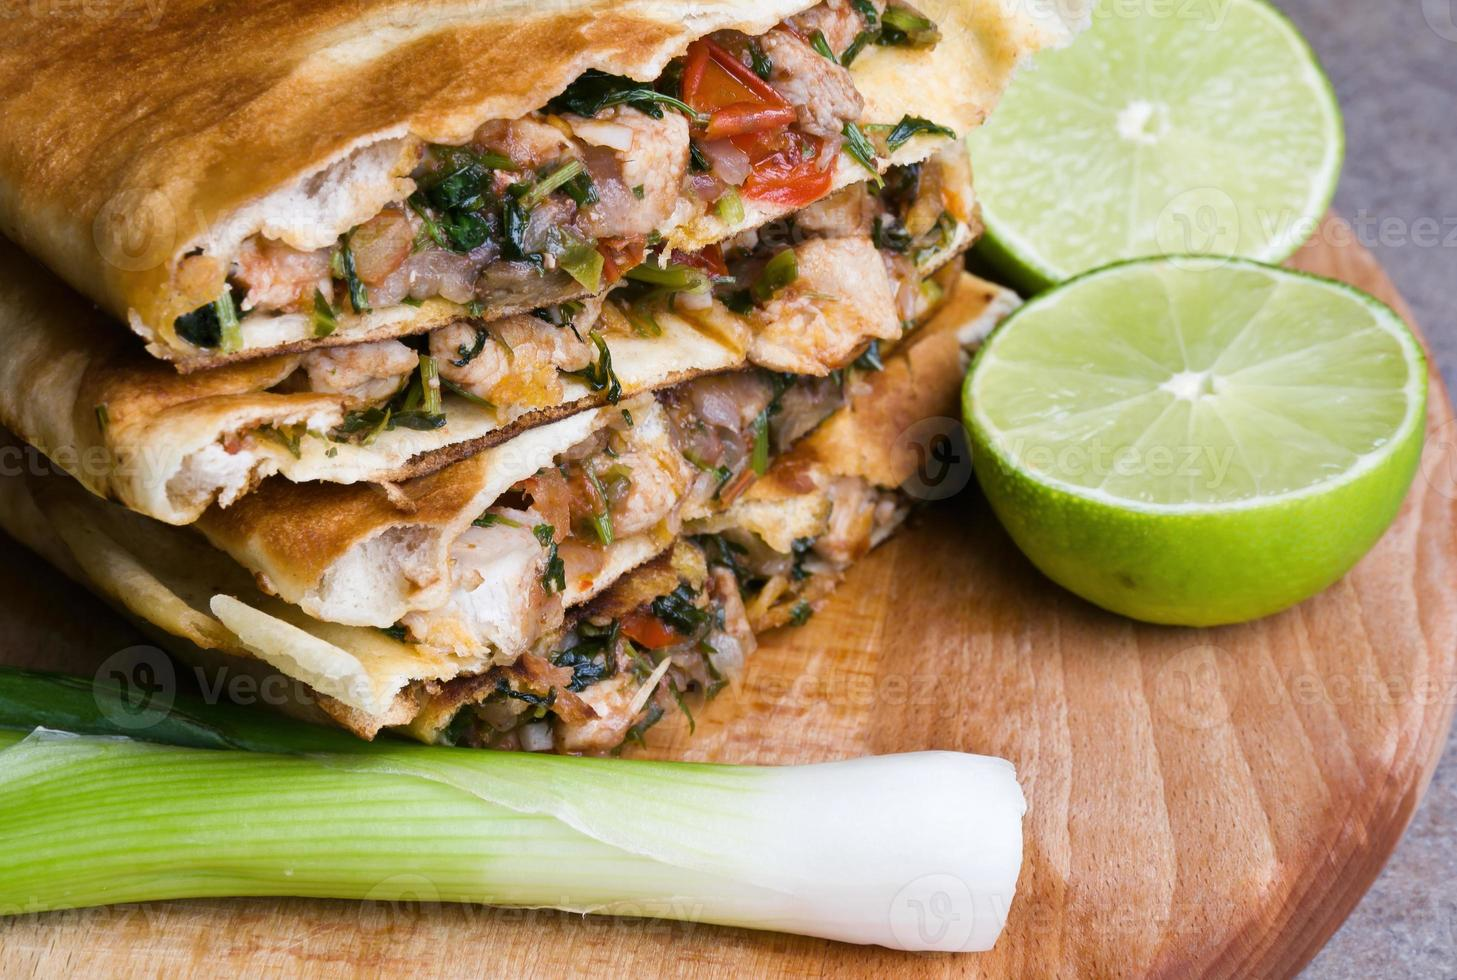 mexikanska quesadillas foto